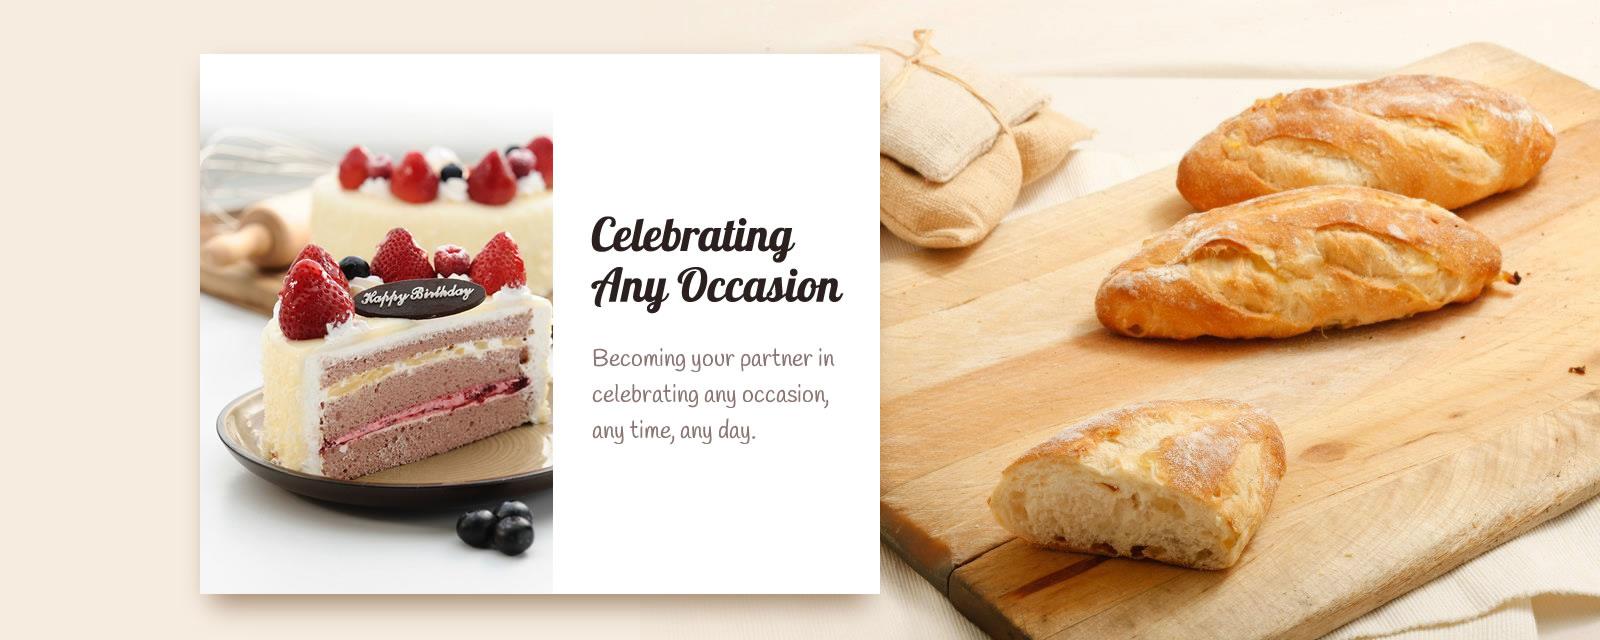 Bakery & patisserie website design Malaysia